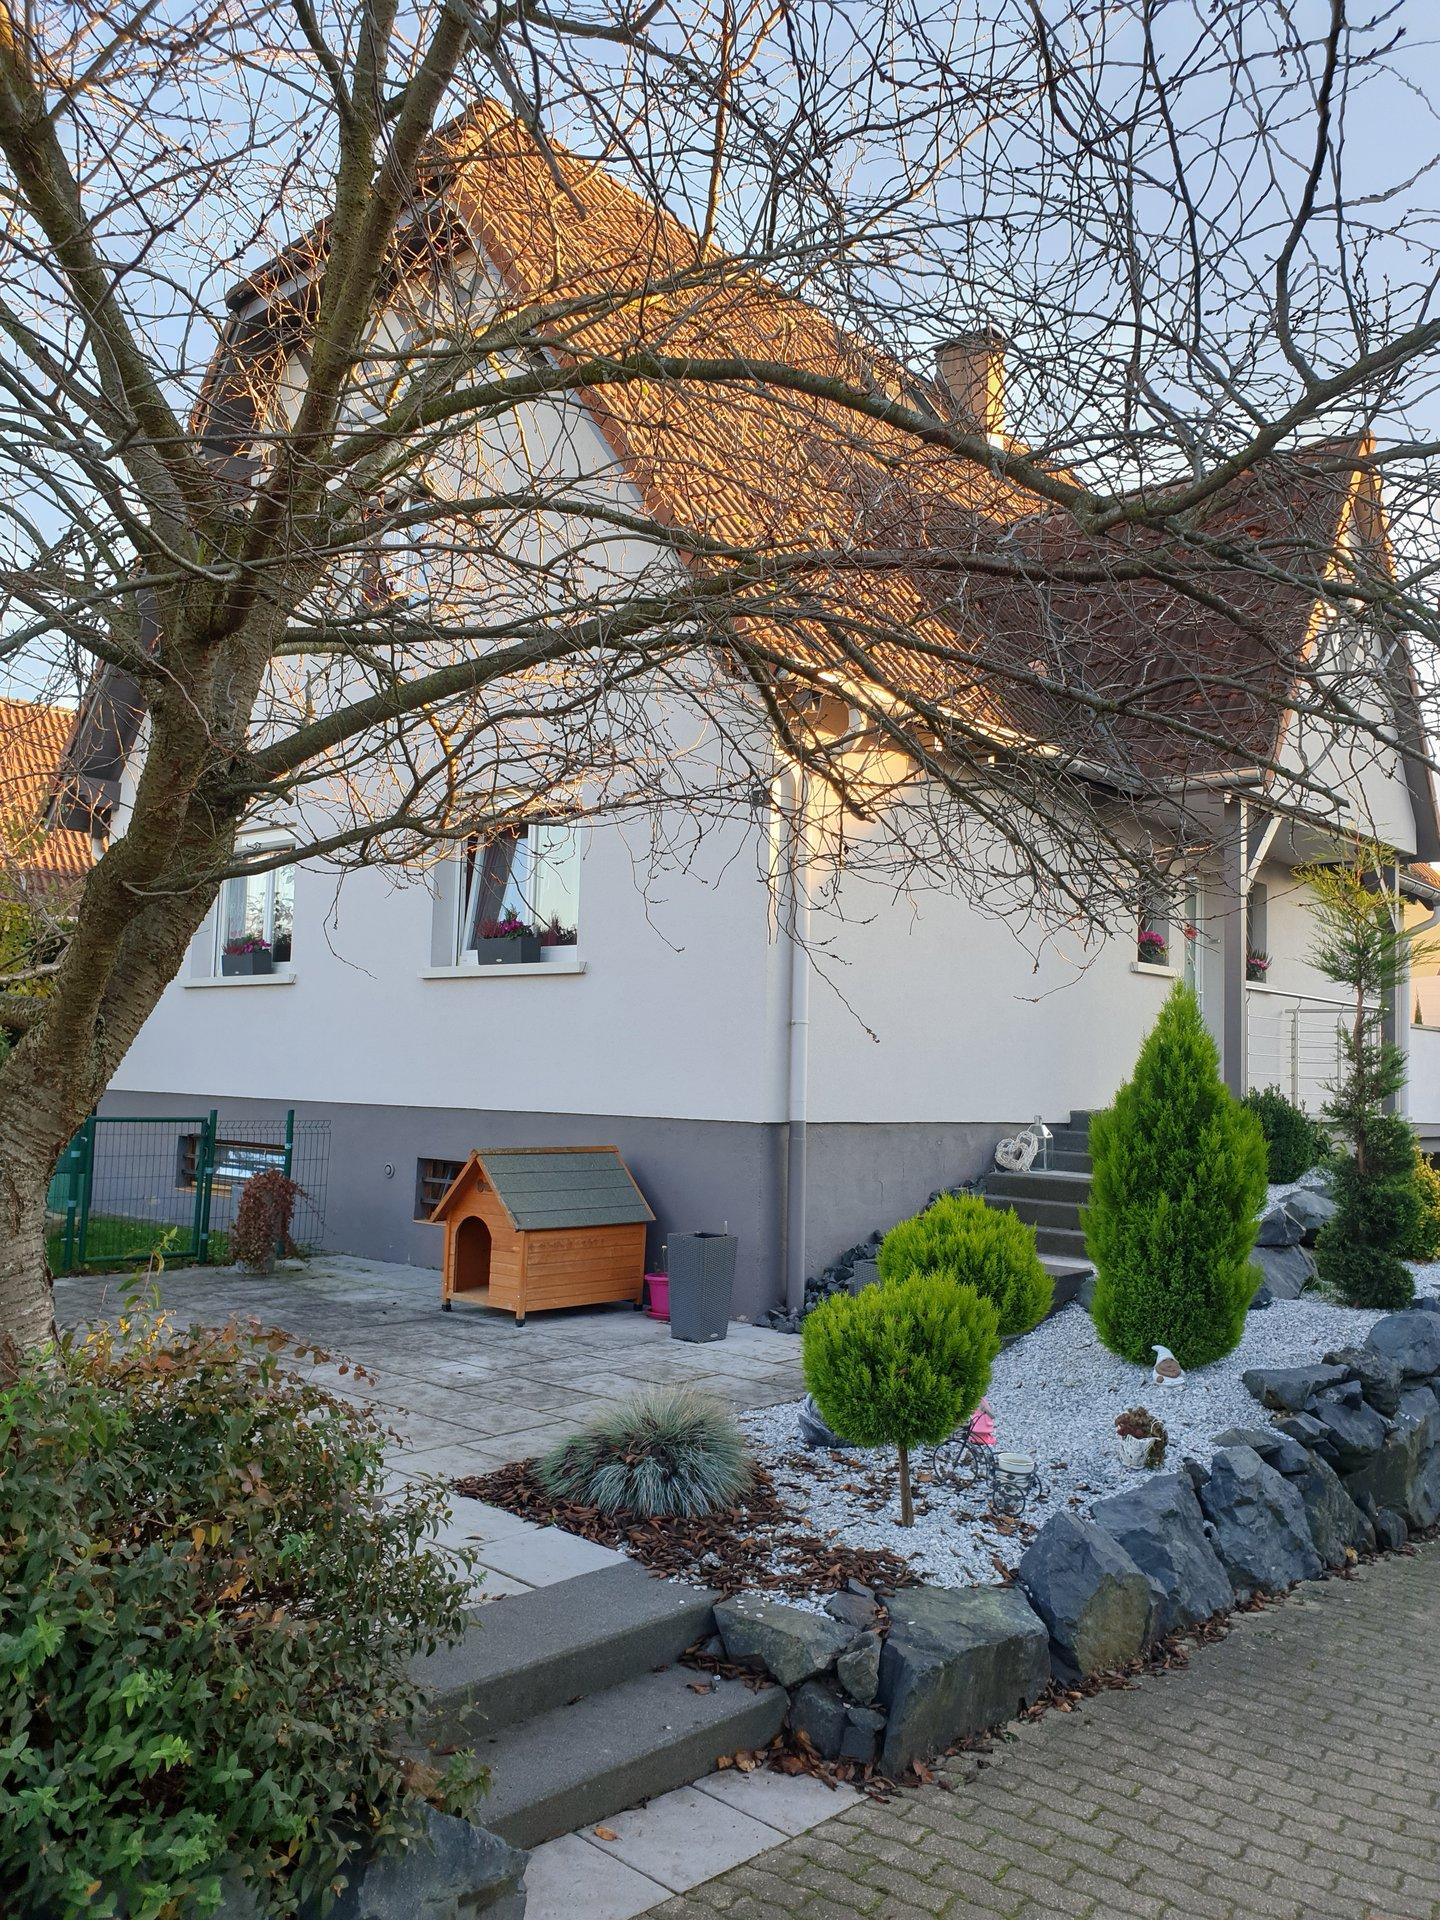 Molsheim - Superbe maison !!